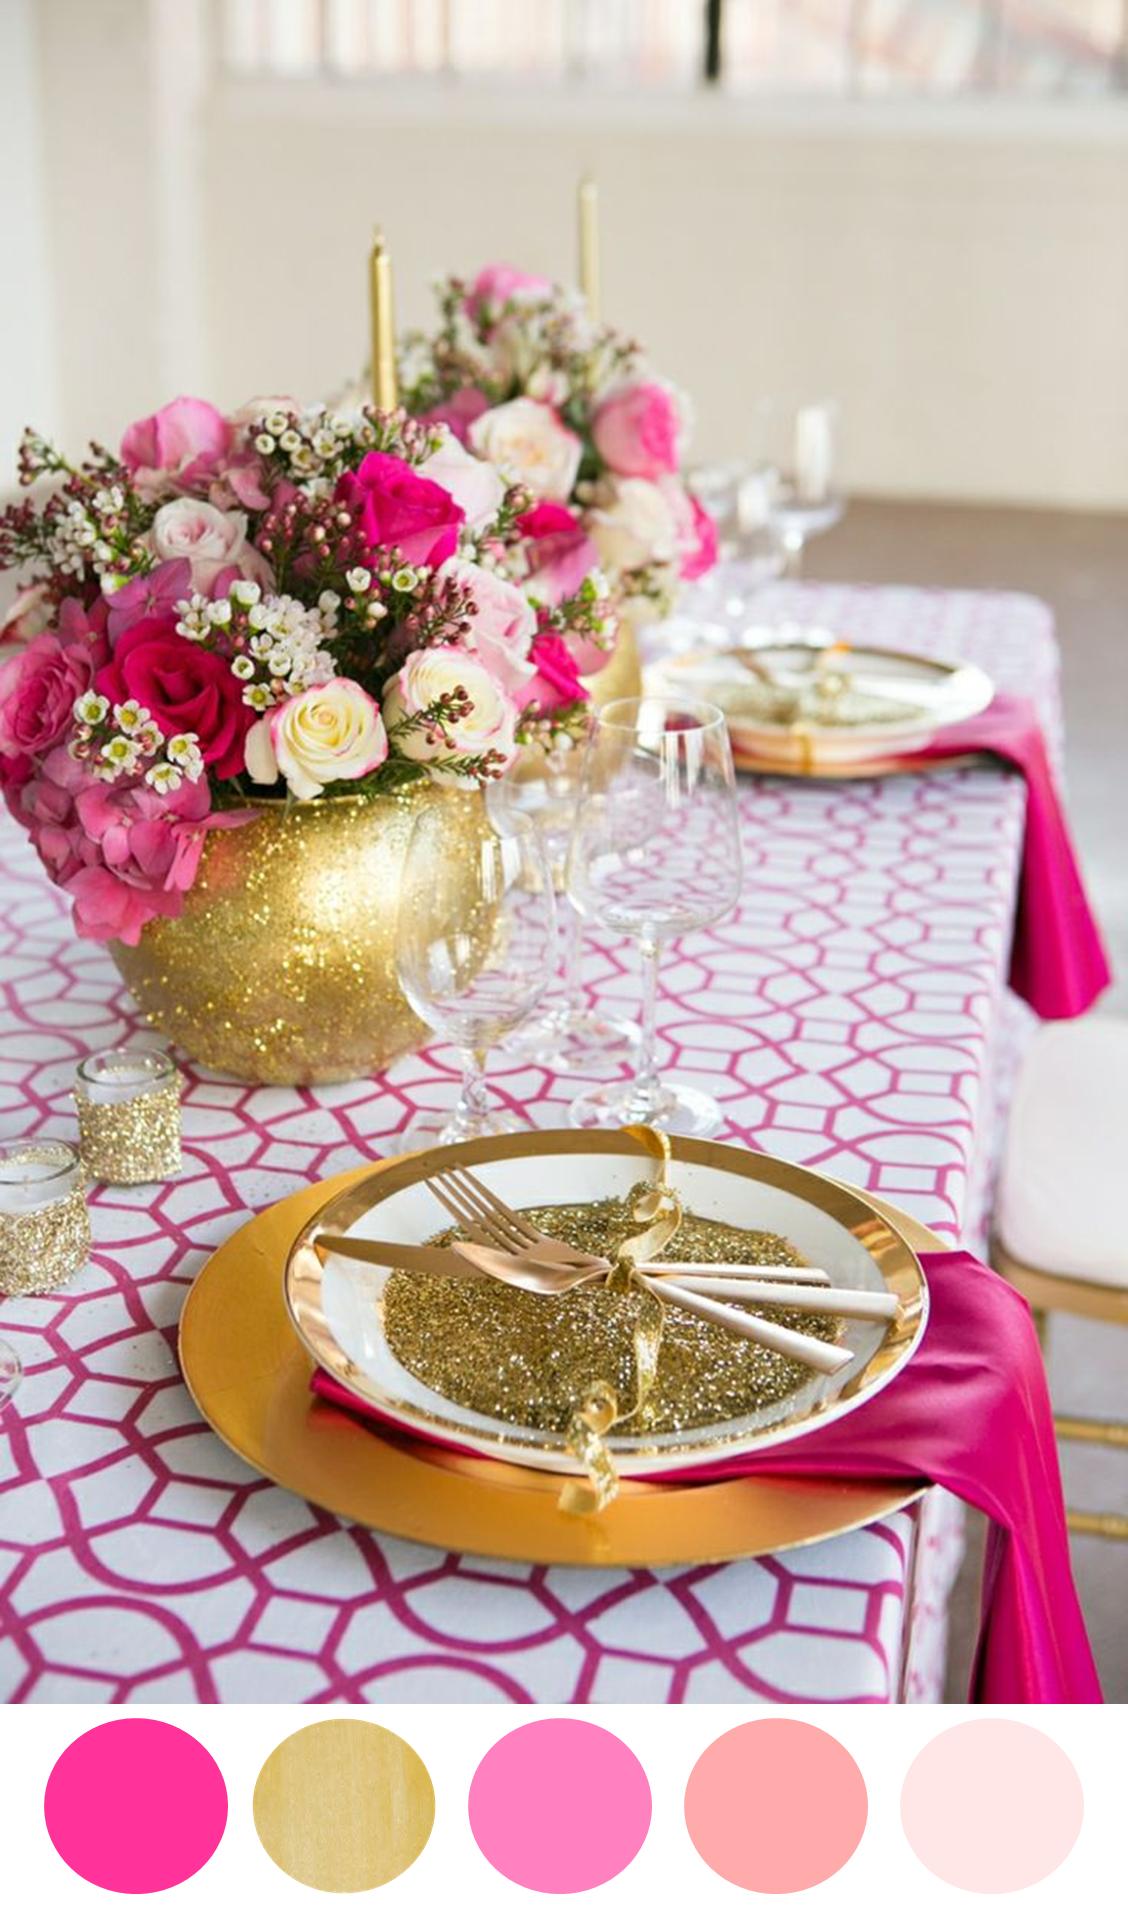 8 Color Inspiring Place Settings Bright Beautiful Hot Pink Weddingsgold